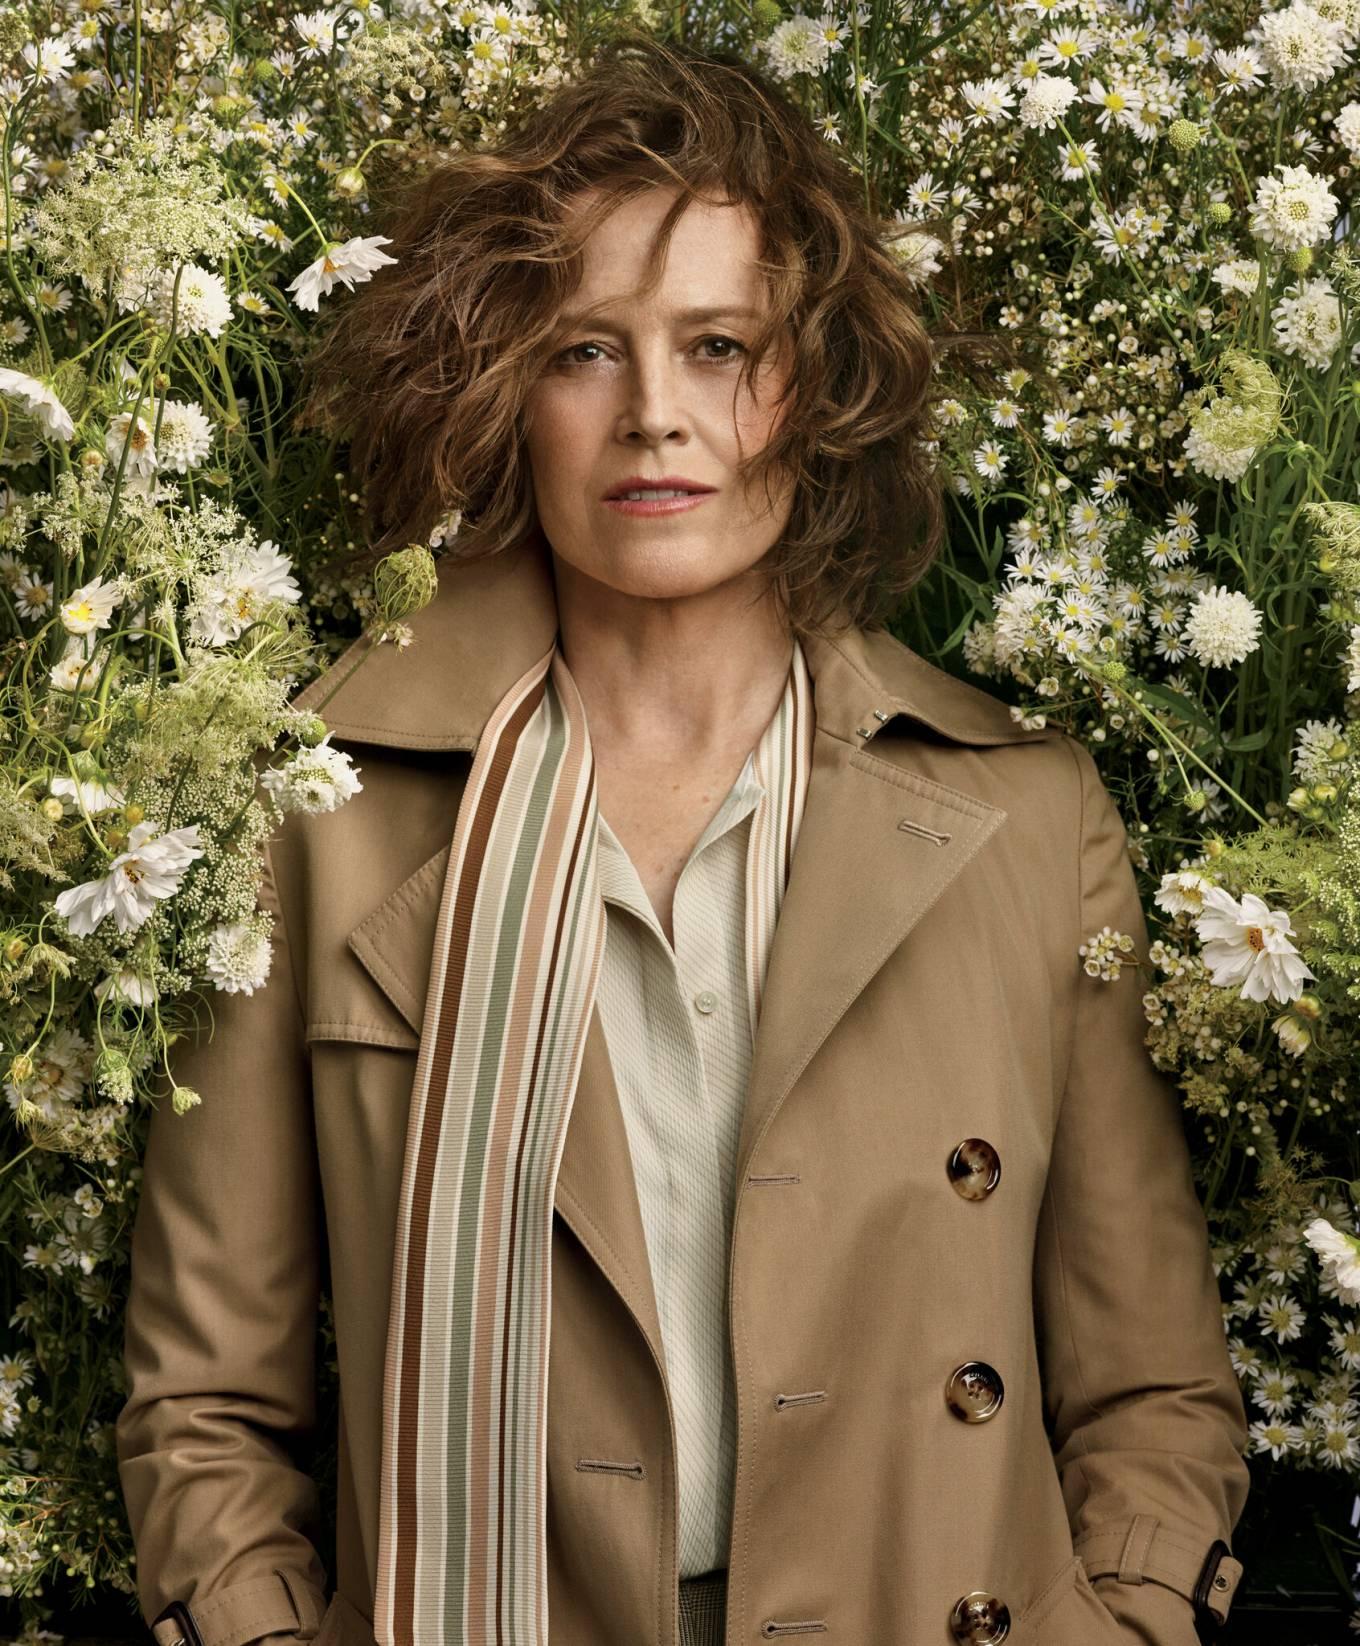 Sigourney Weaver - 2020 Craig McDean Photoshoot